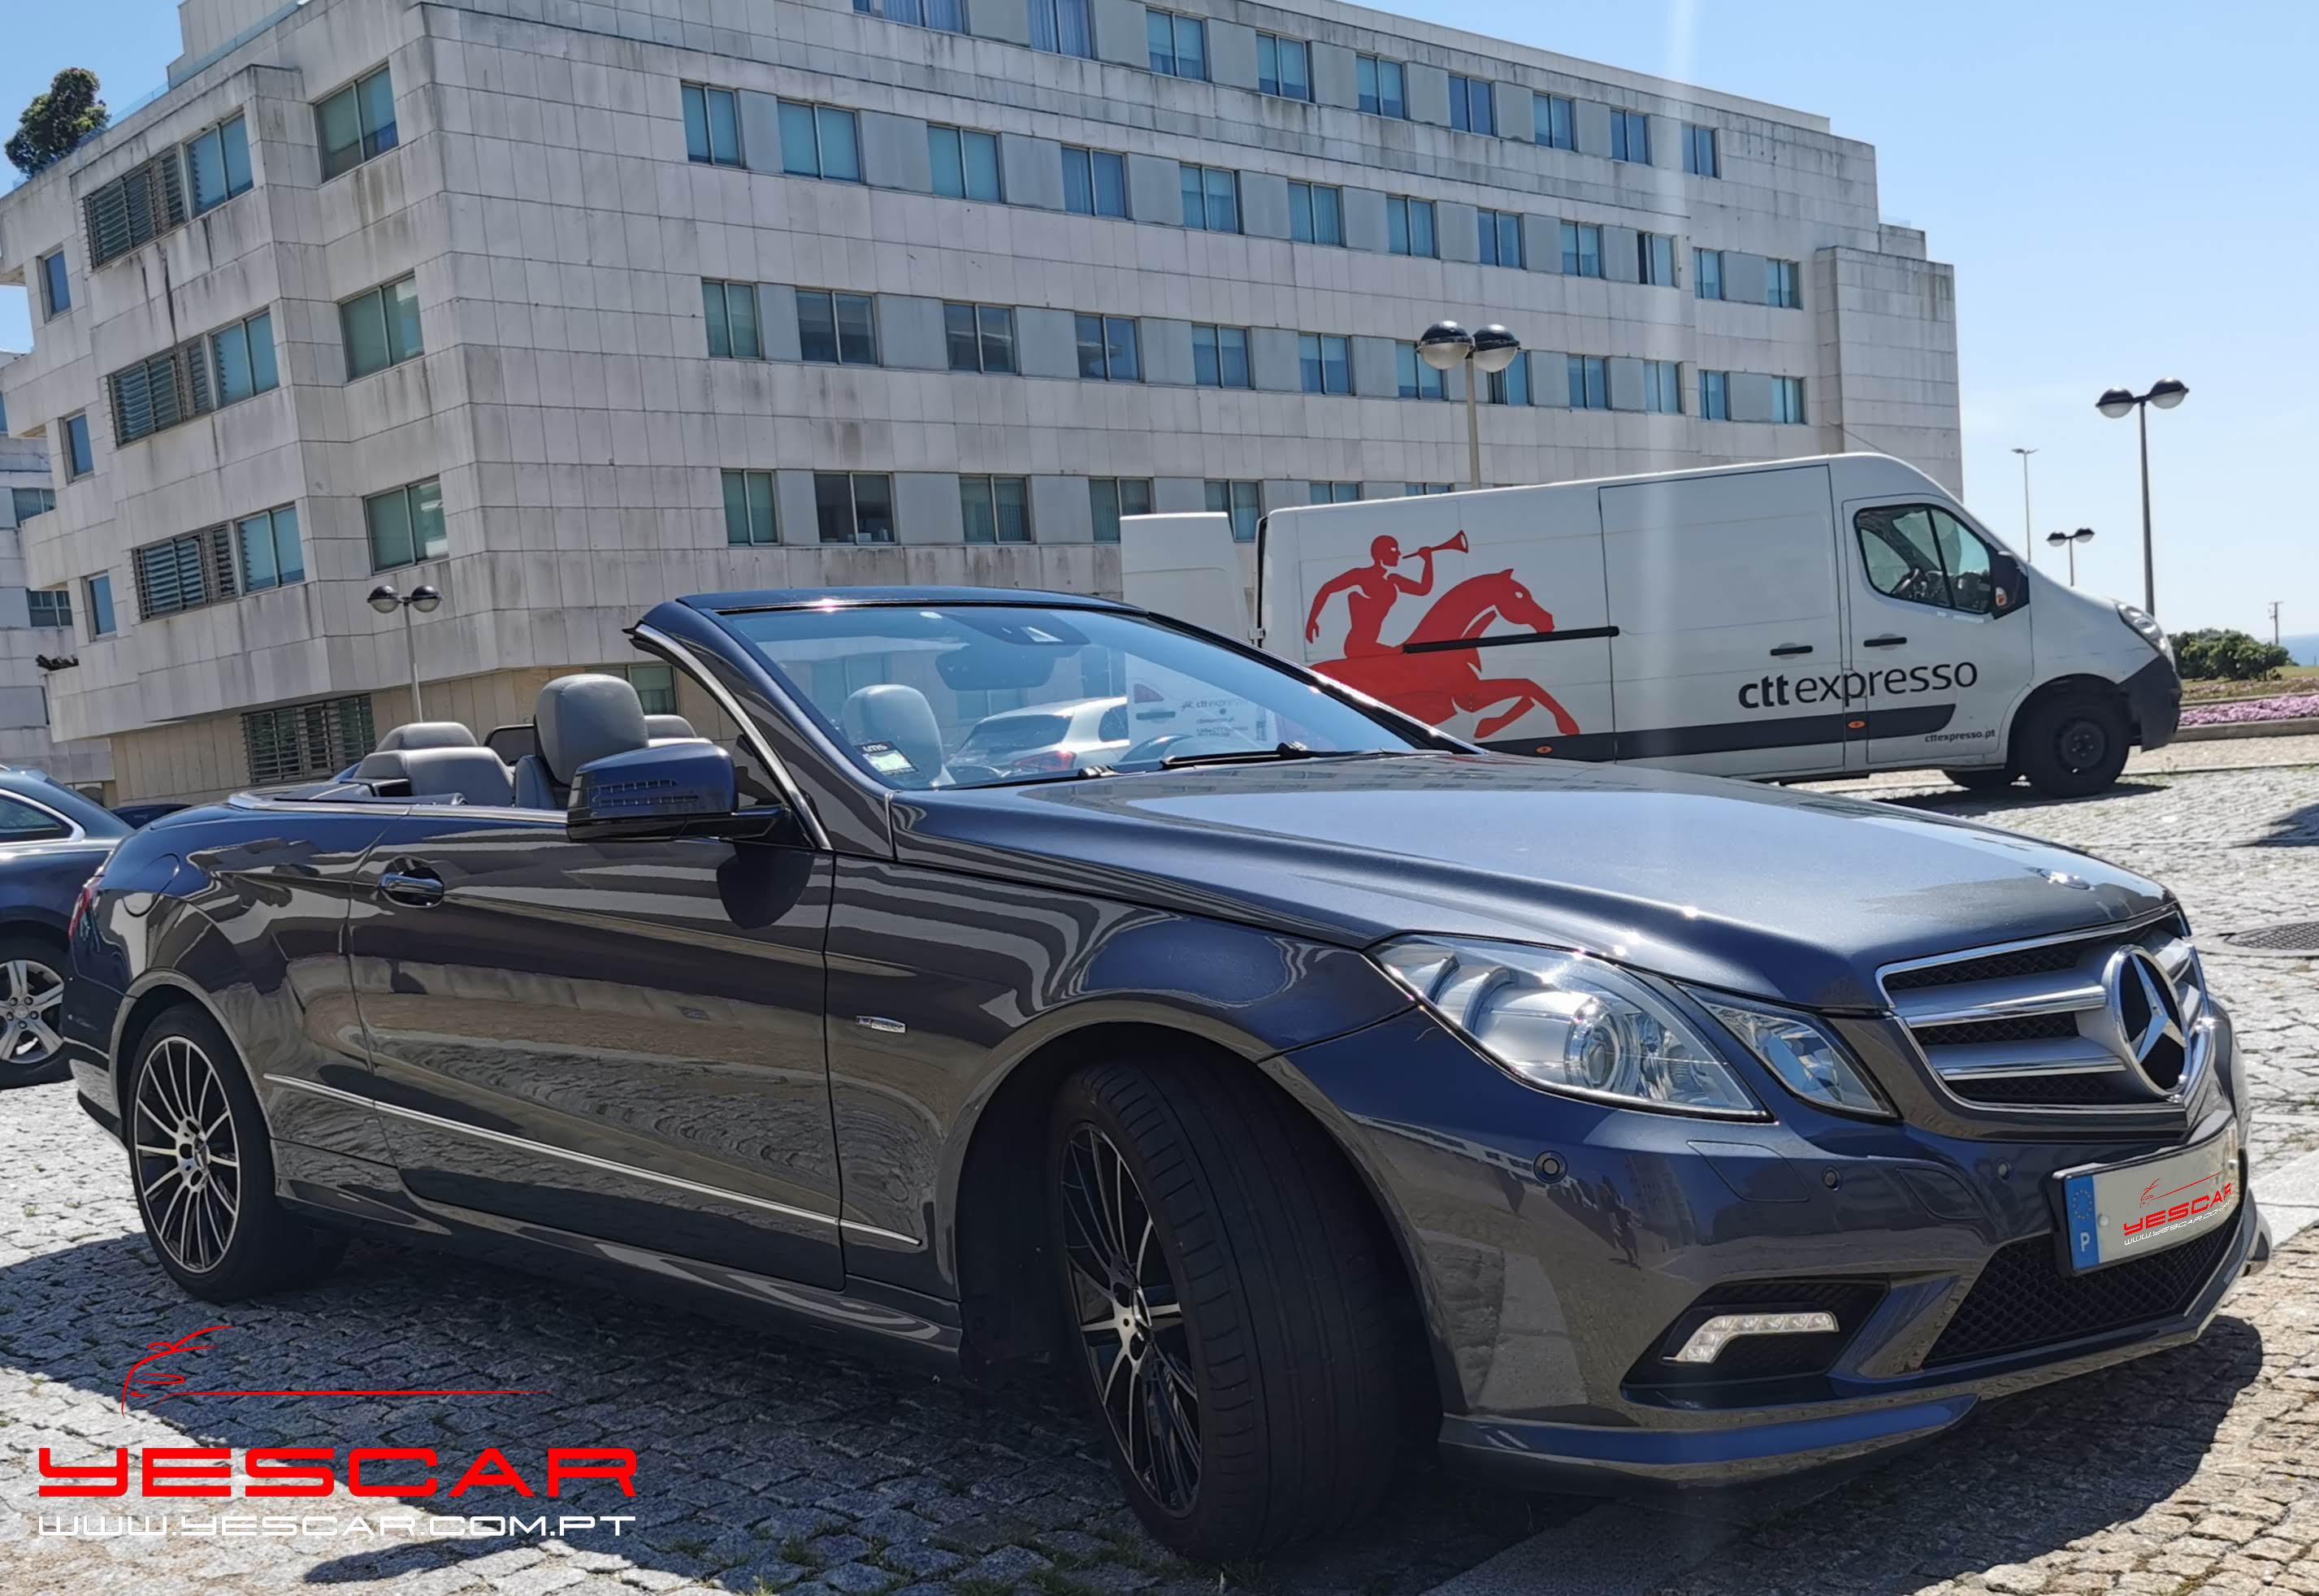 Mercedes Benz Classe E coupe cabrio  YESCAR automóveis  Rua António Enes 51 Porto